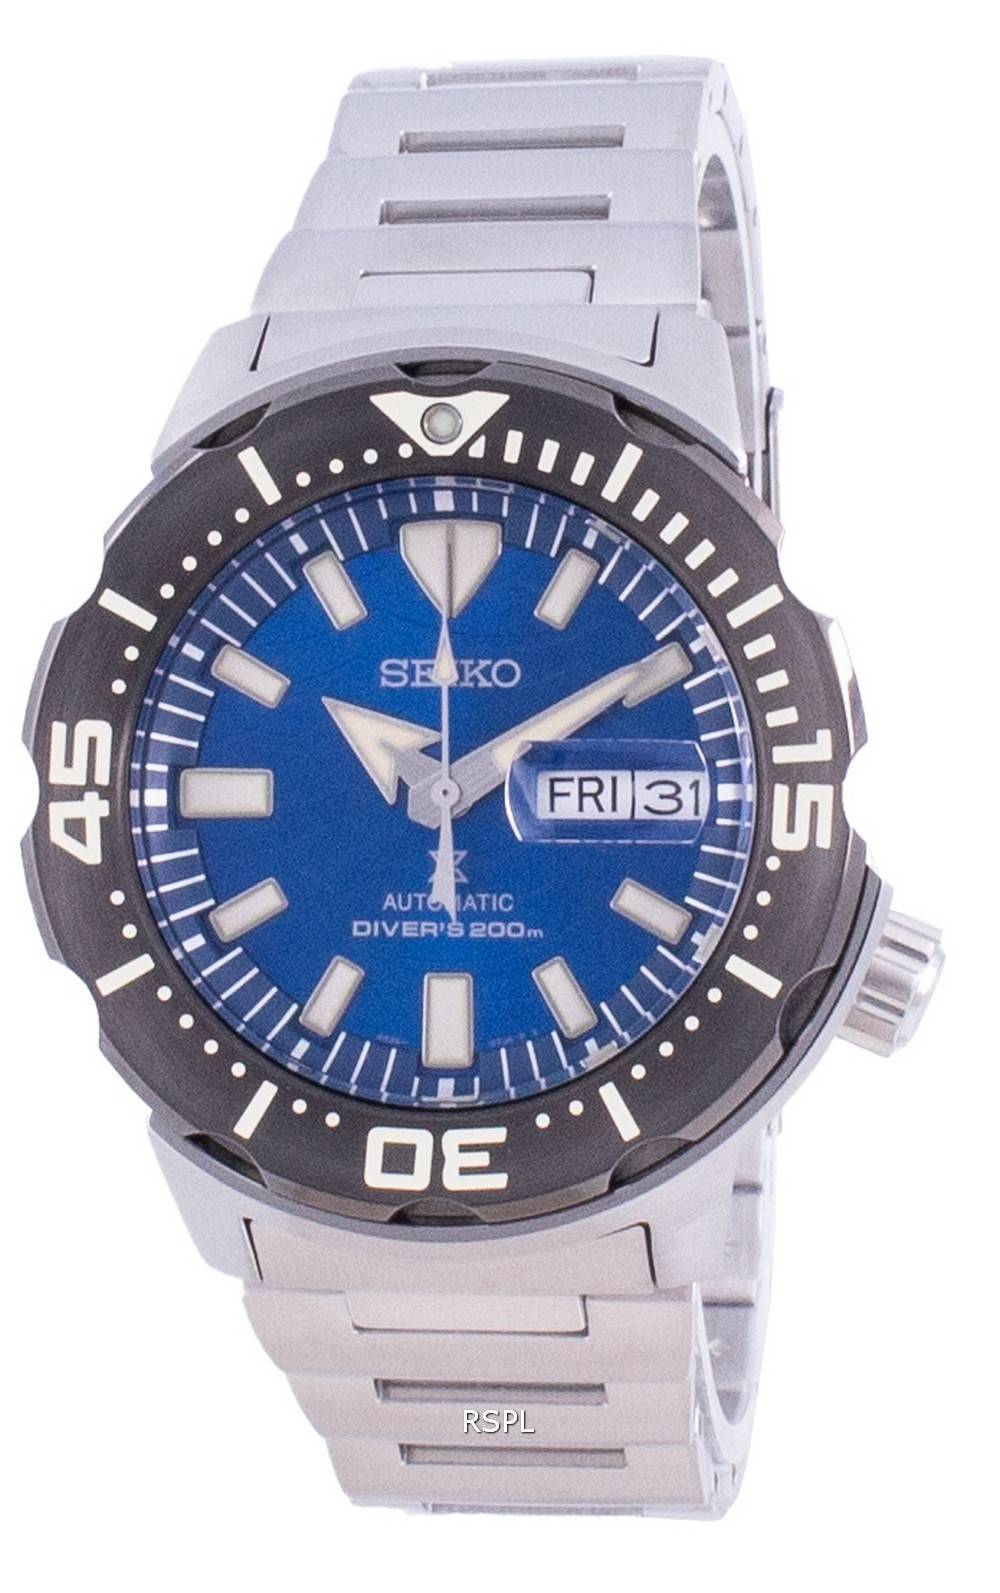 Seiko Prospex Save The Ocean Special Edition Diver automaattinen SRPE09 SRPE09K1 SRPE09K 200M miesten kello